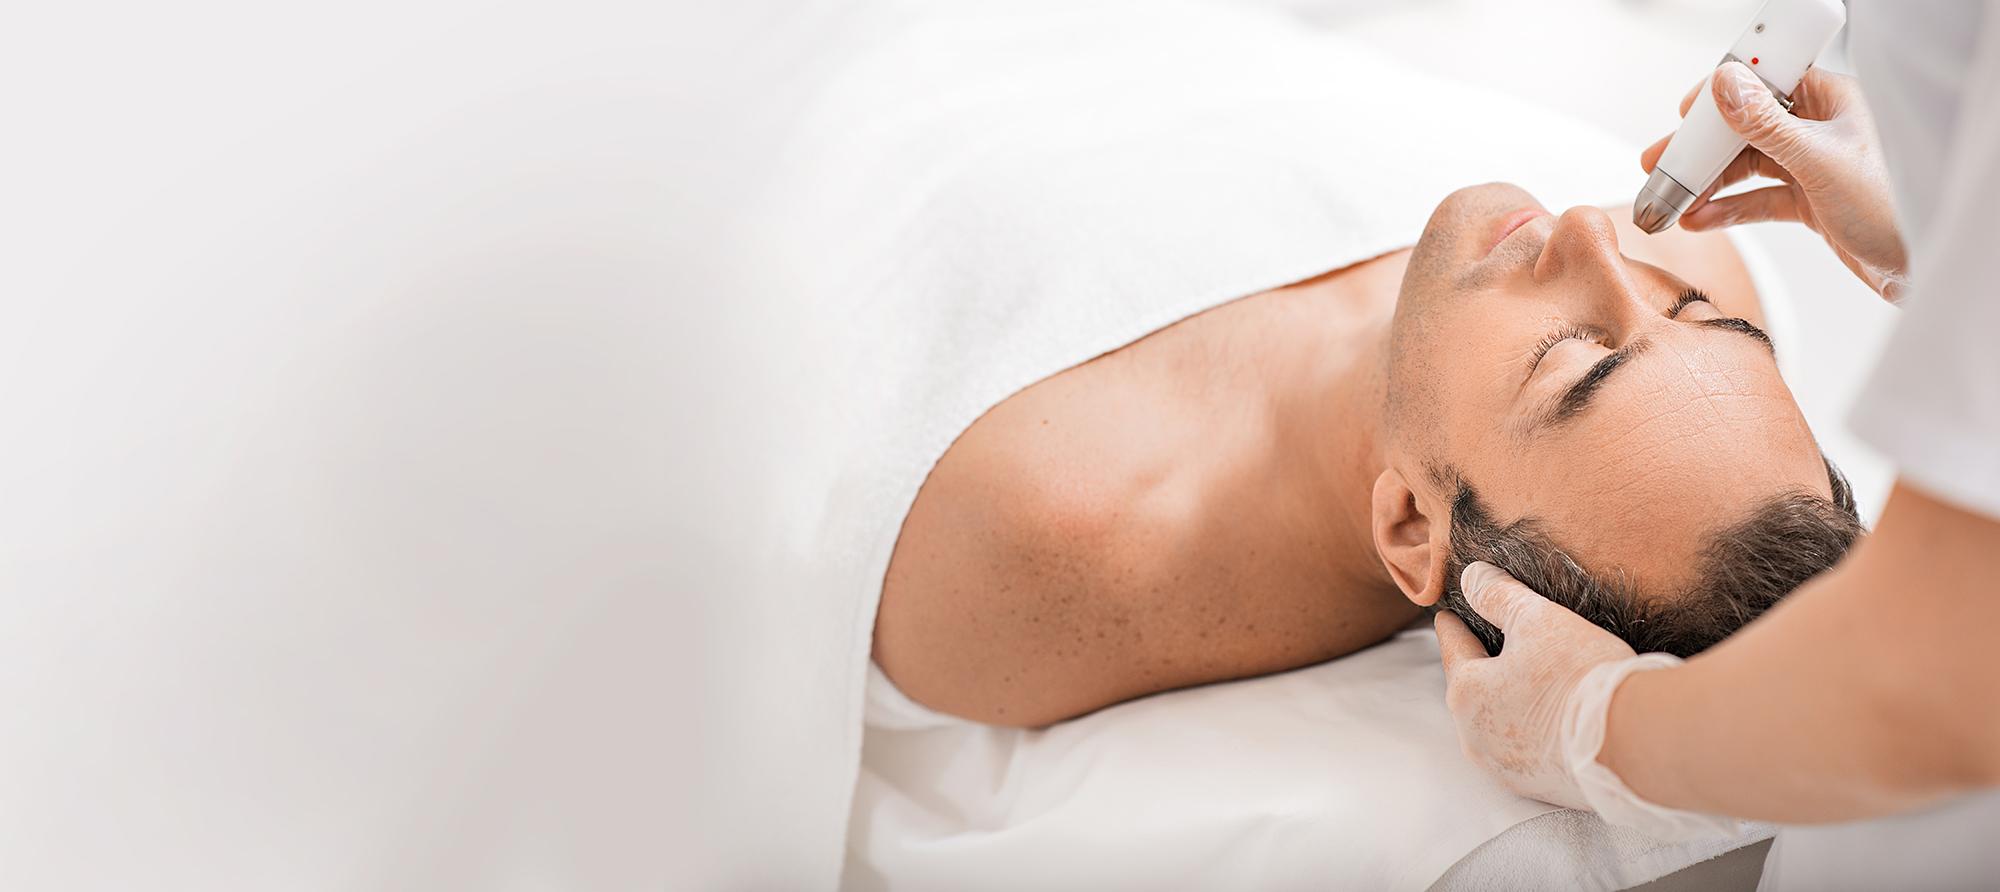 Schedule A Consultation Medical Aesthetics Senara Men S Health Center